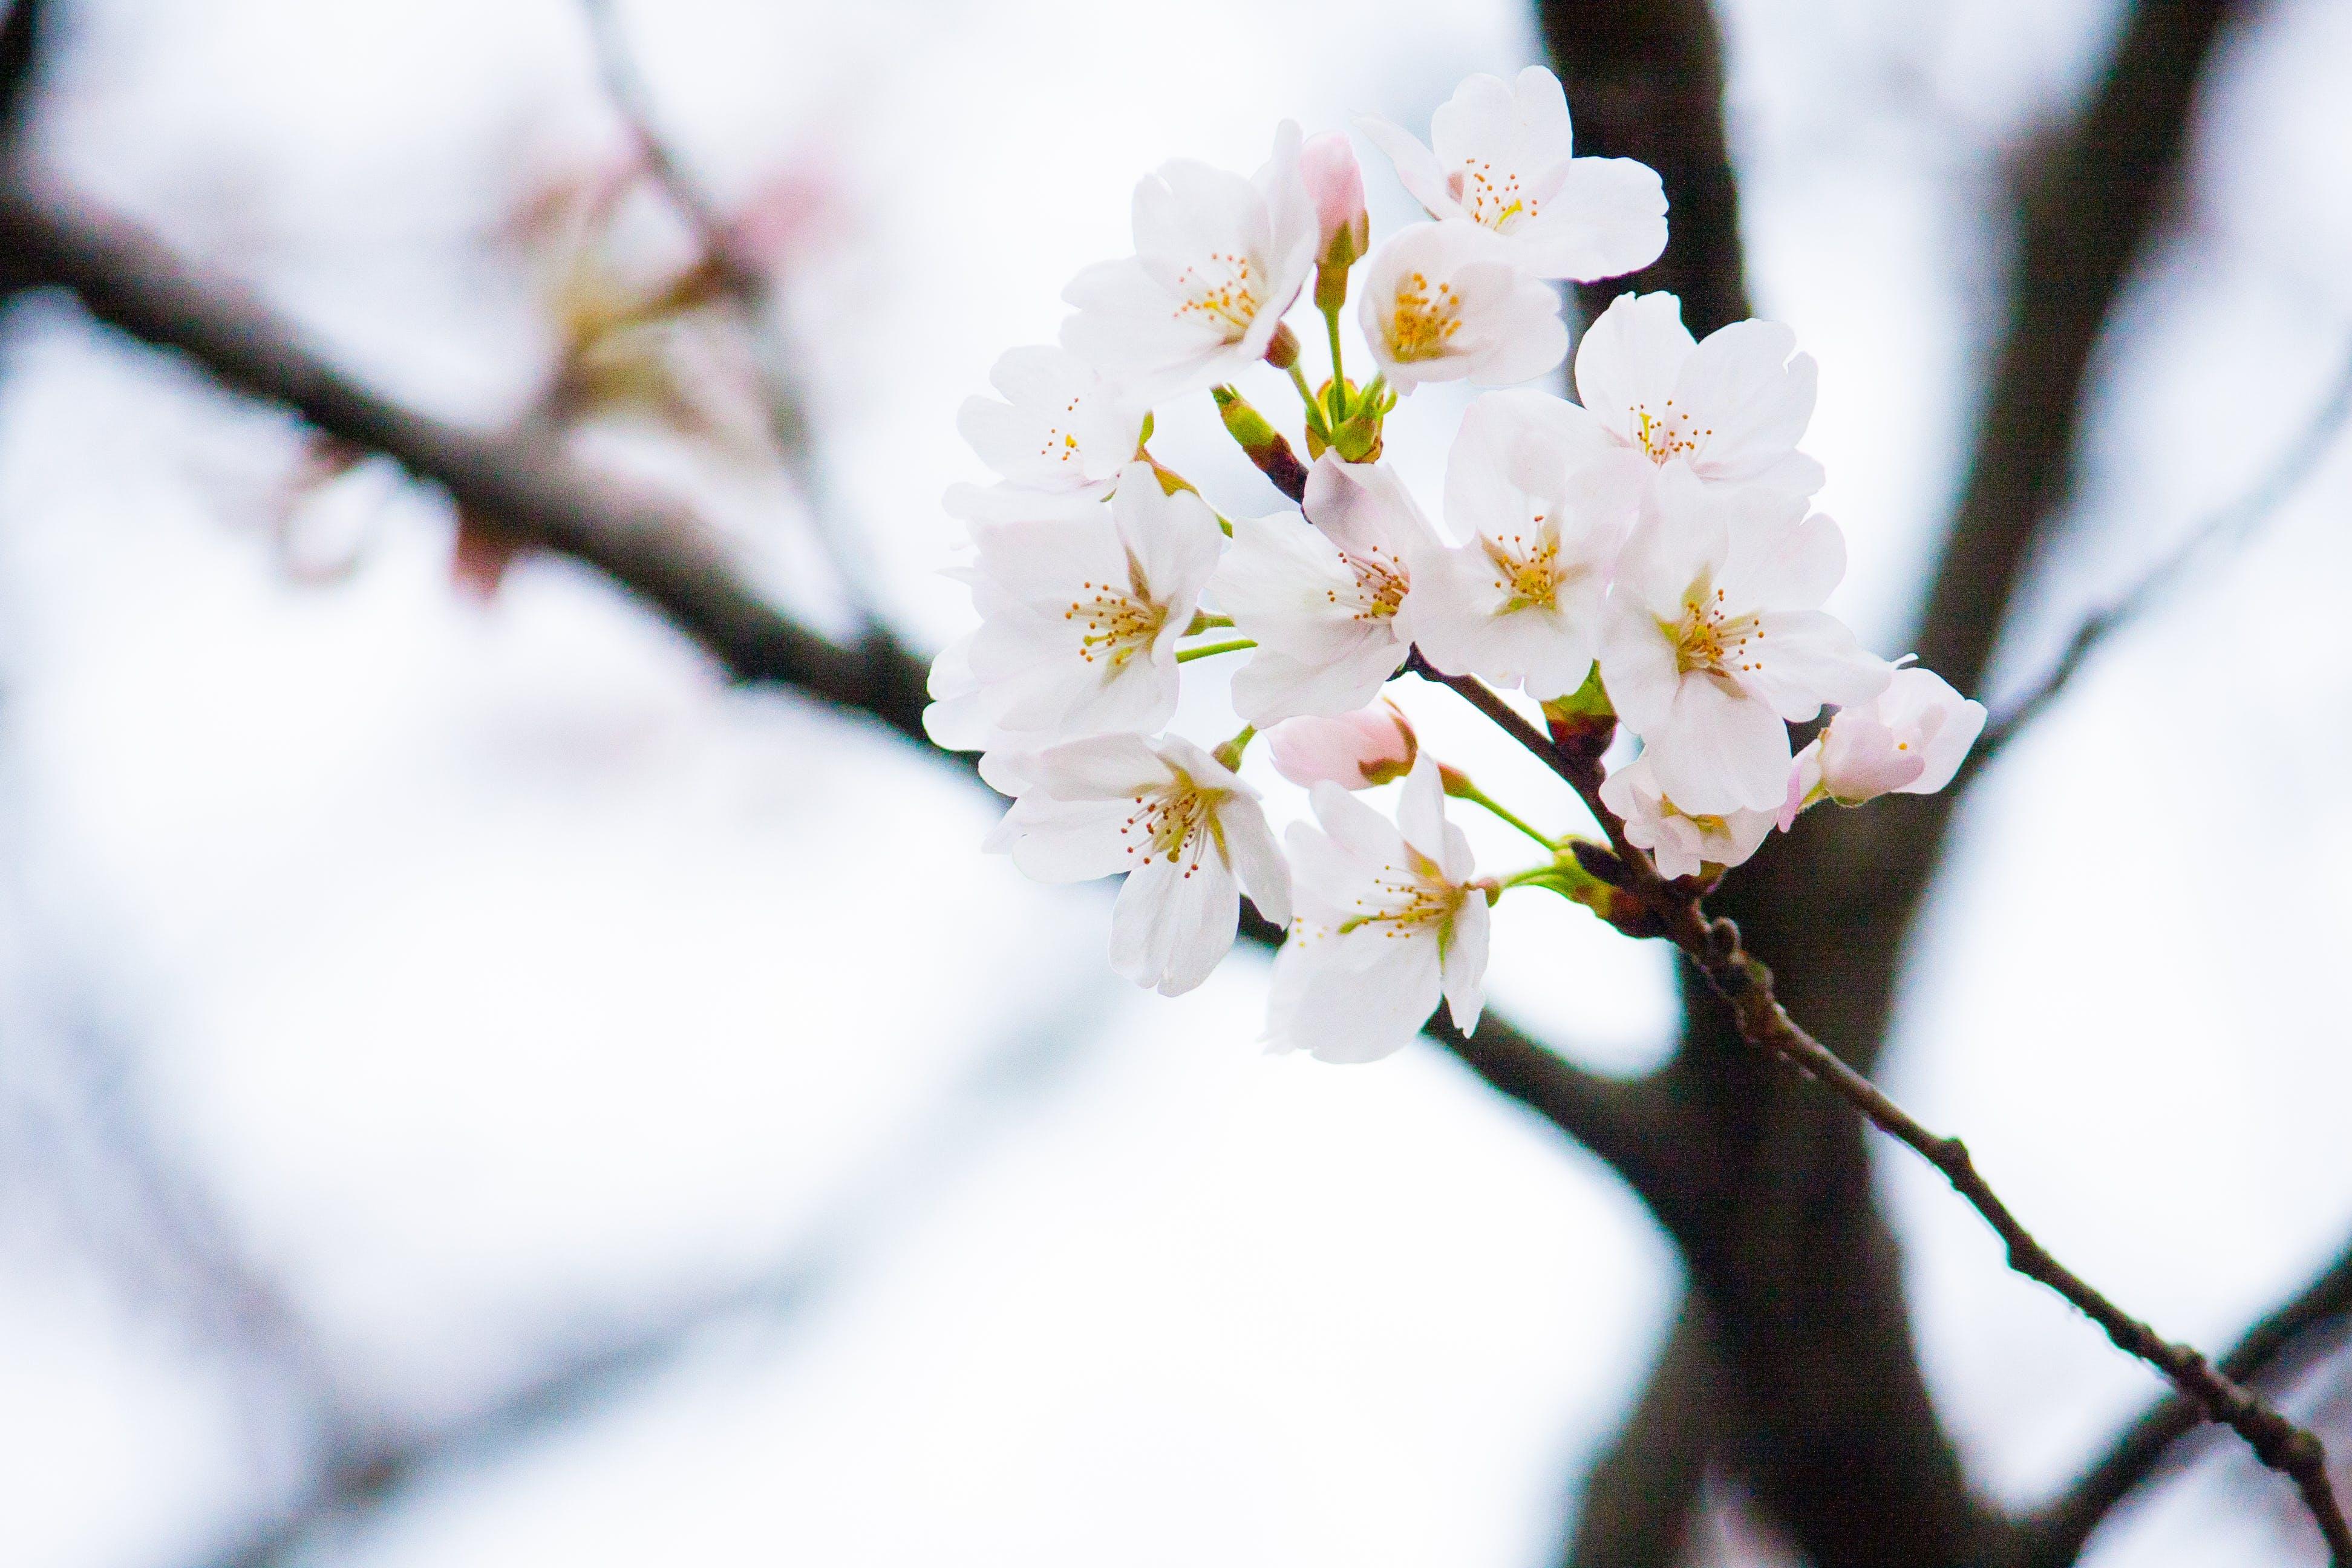 Kostnadsfri bild av blomknoppar, blomma, blommor, blomning